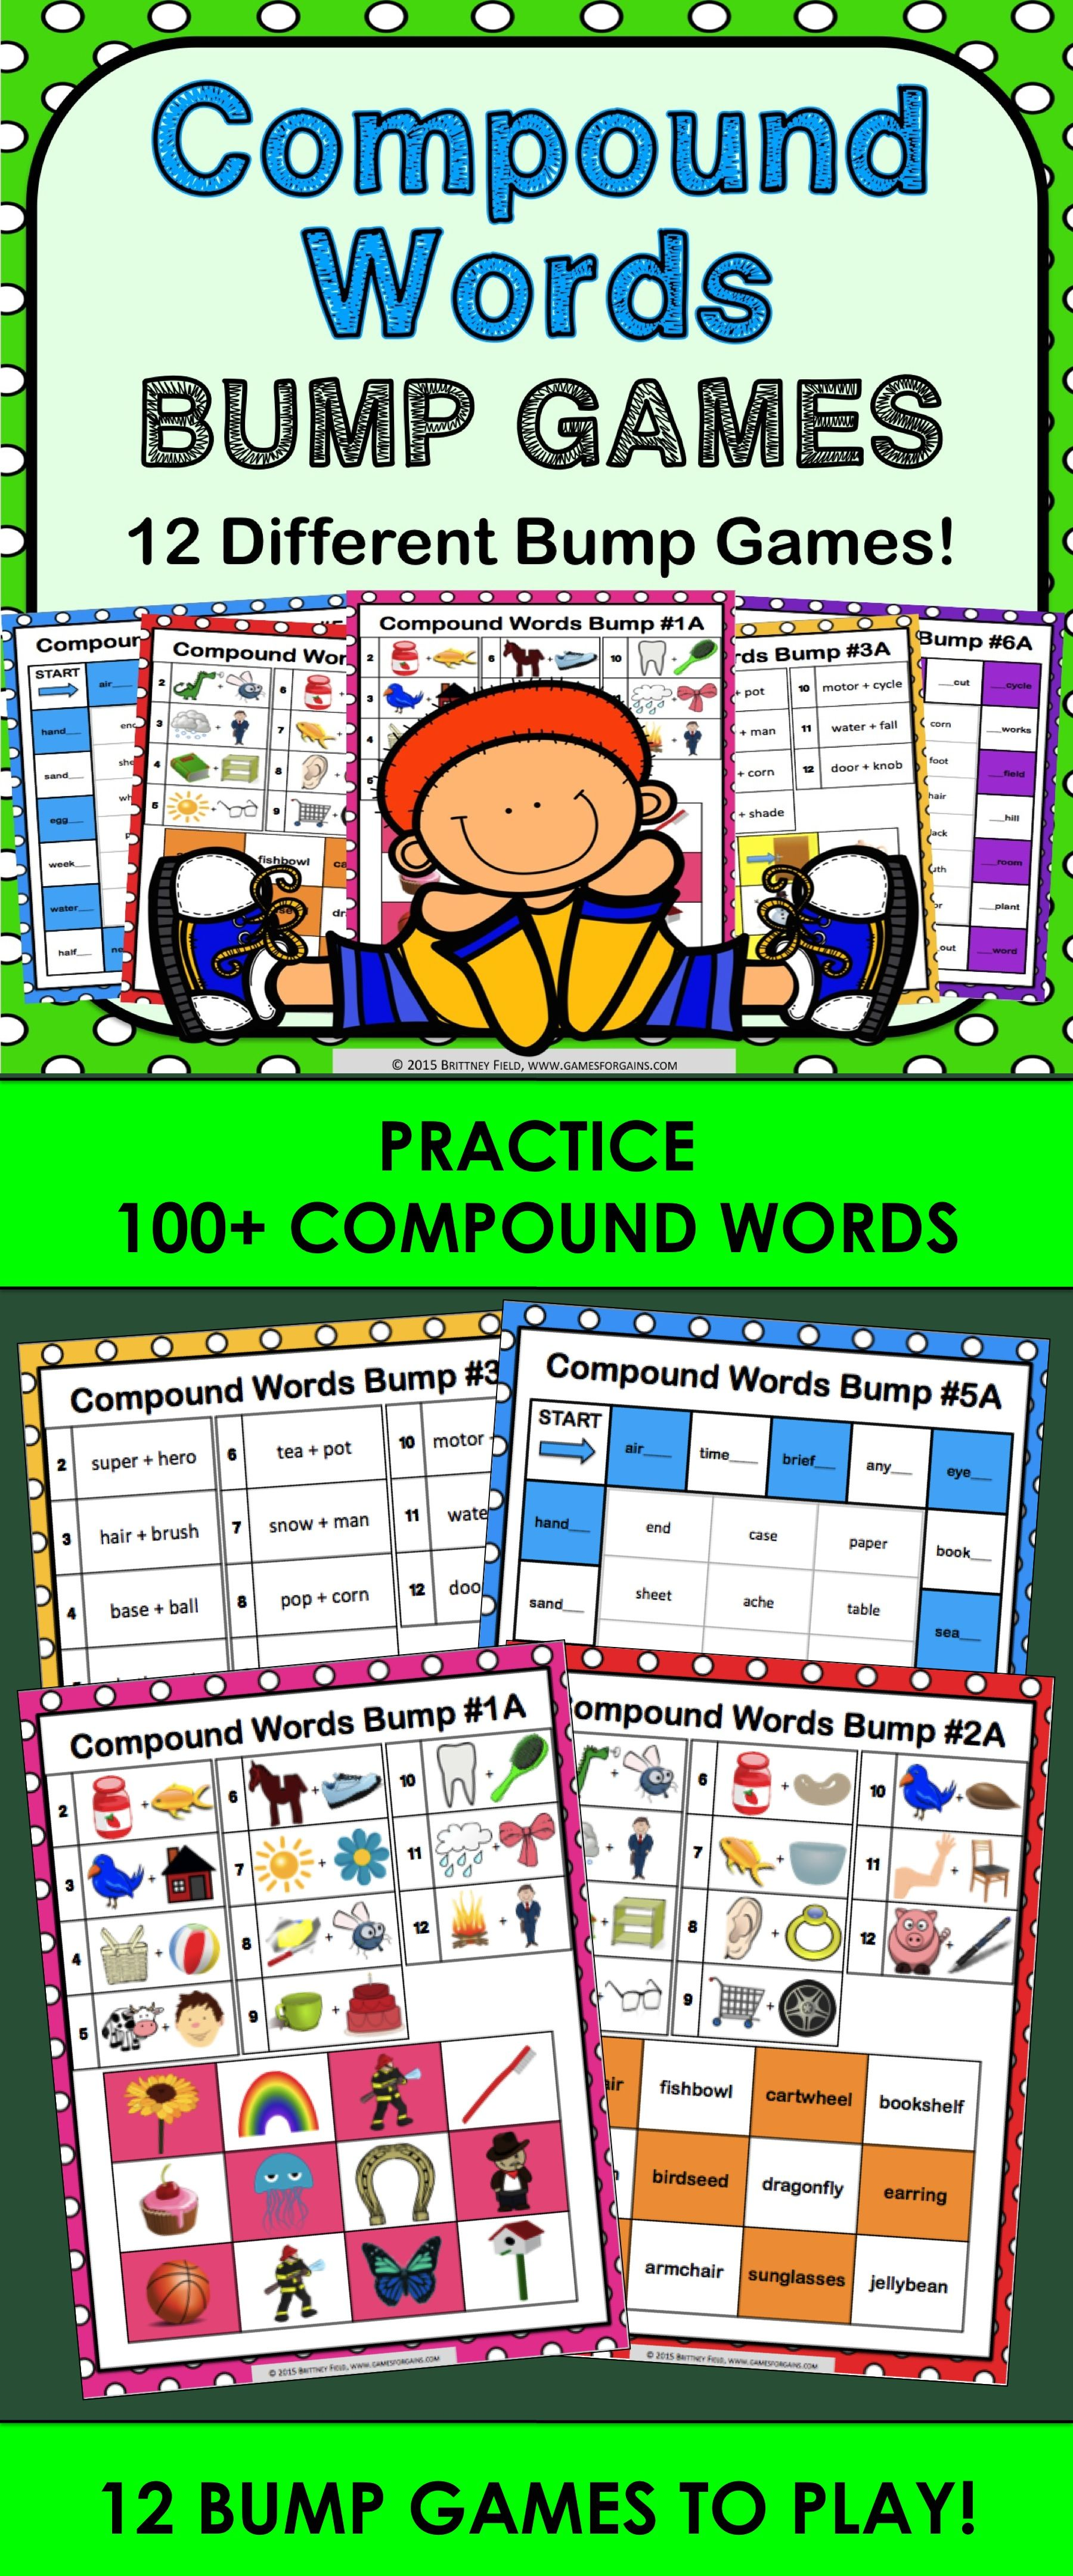 Bump Compound Words Activity 12 Compound Words Games